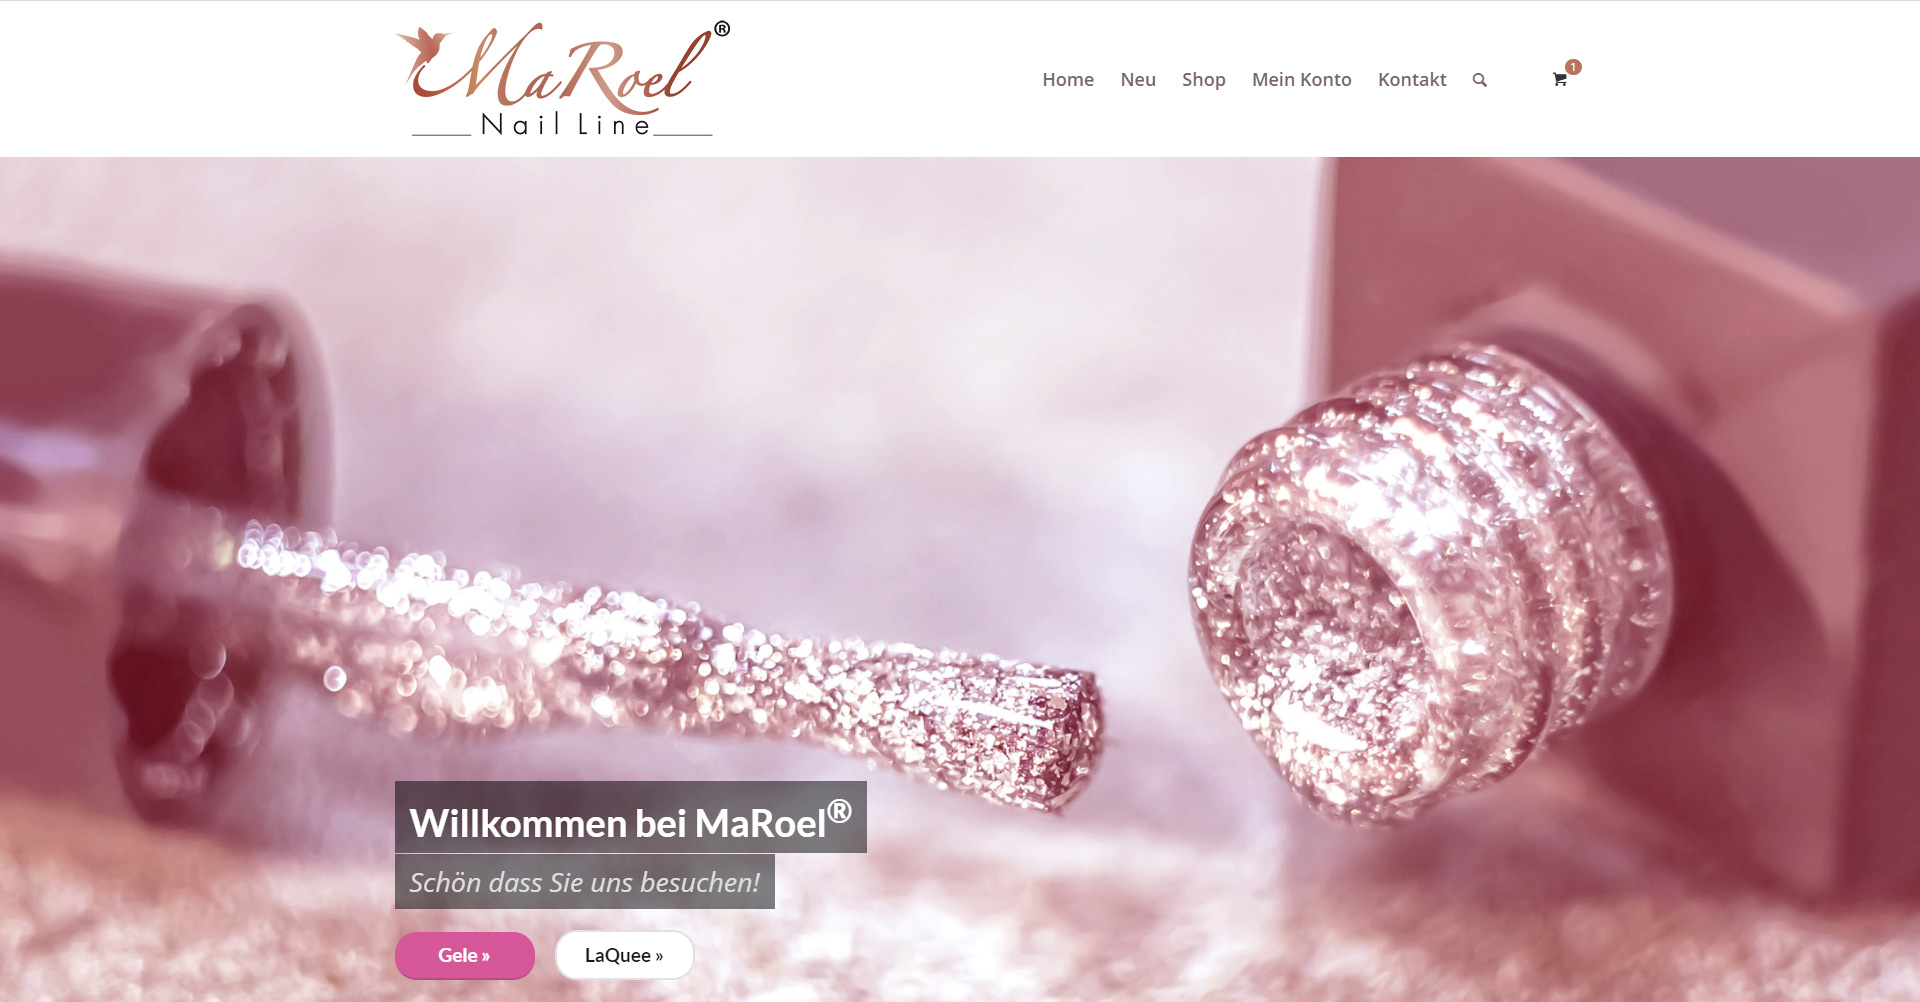 Online-Shop für MaRoel® Nail Line, 90427 Nürnberg